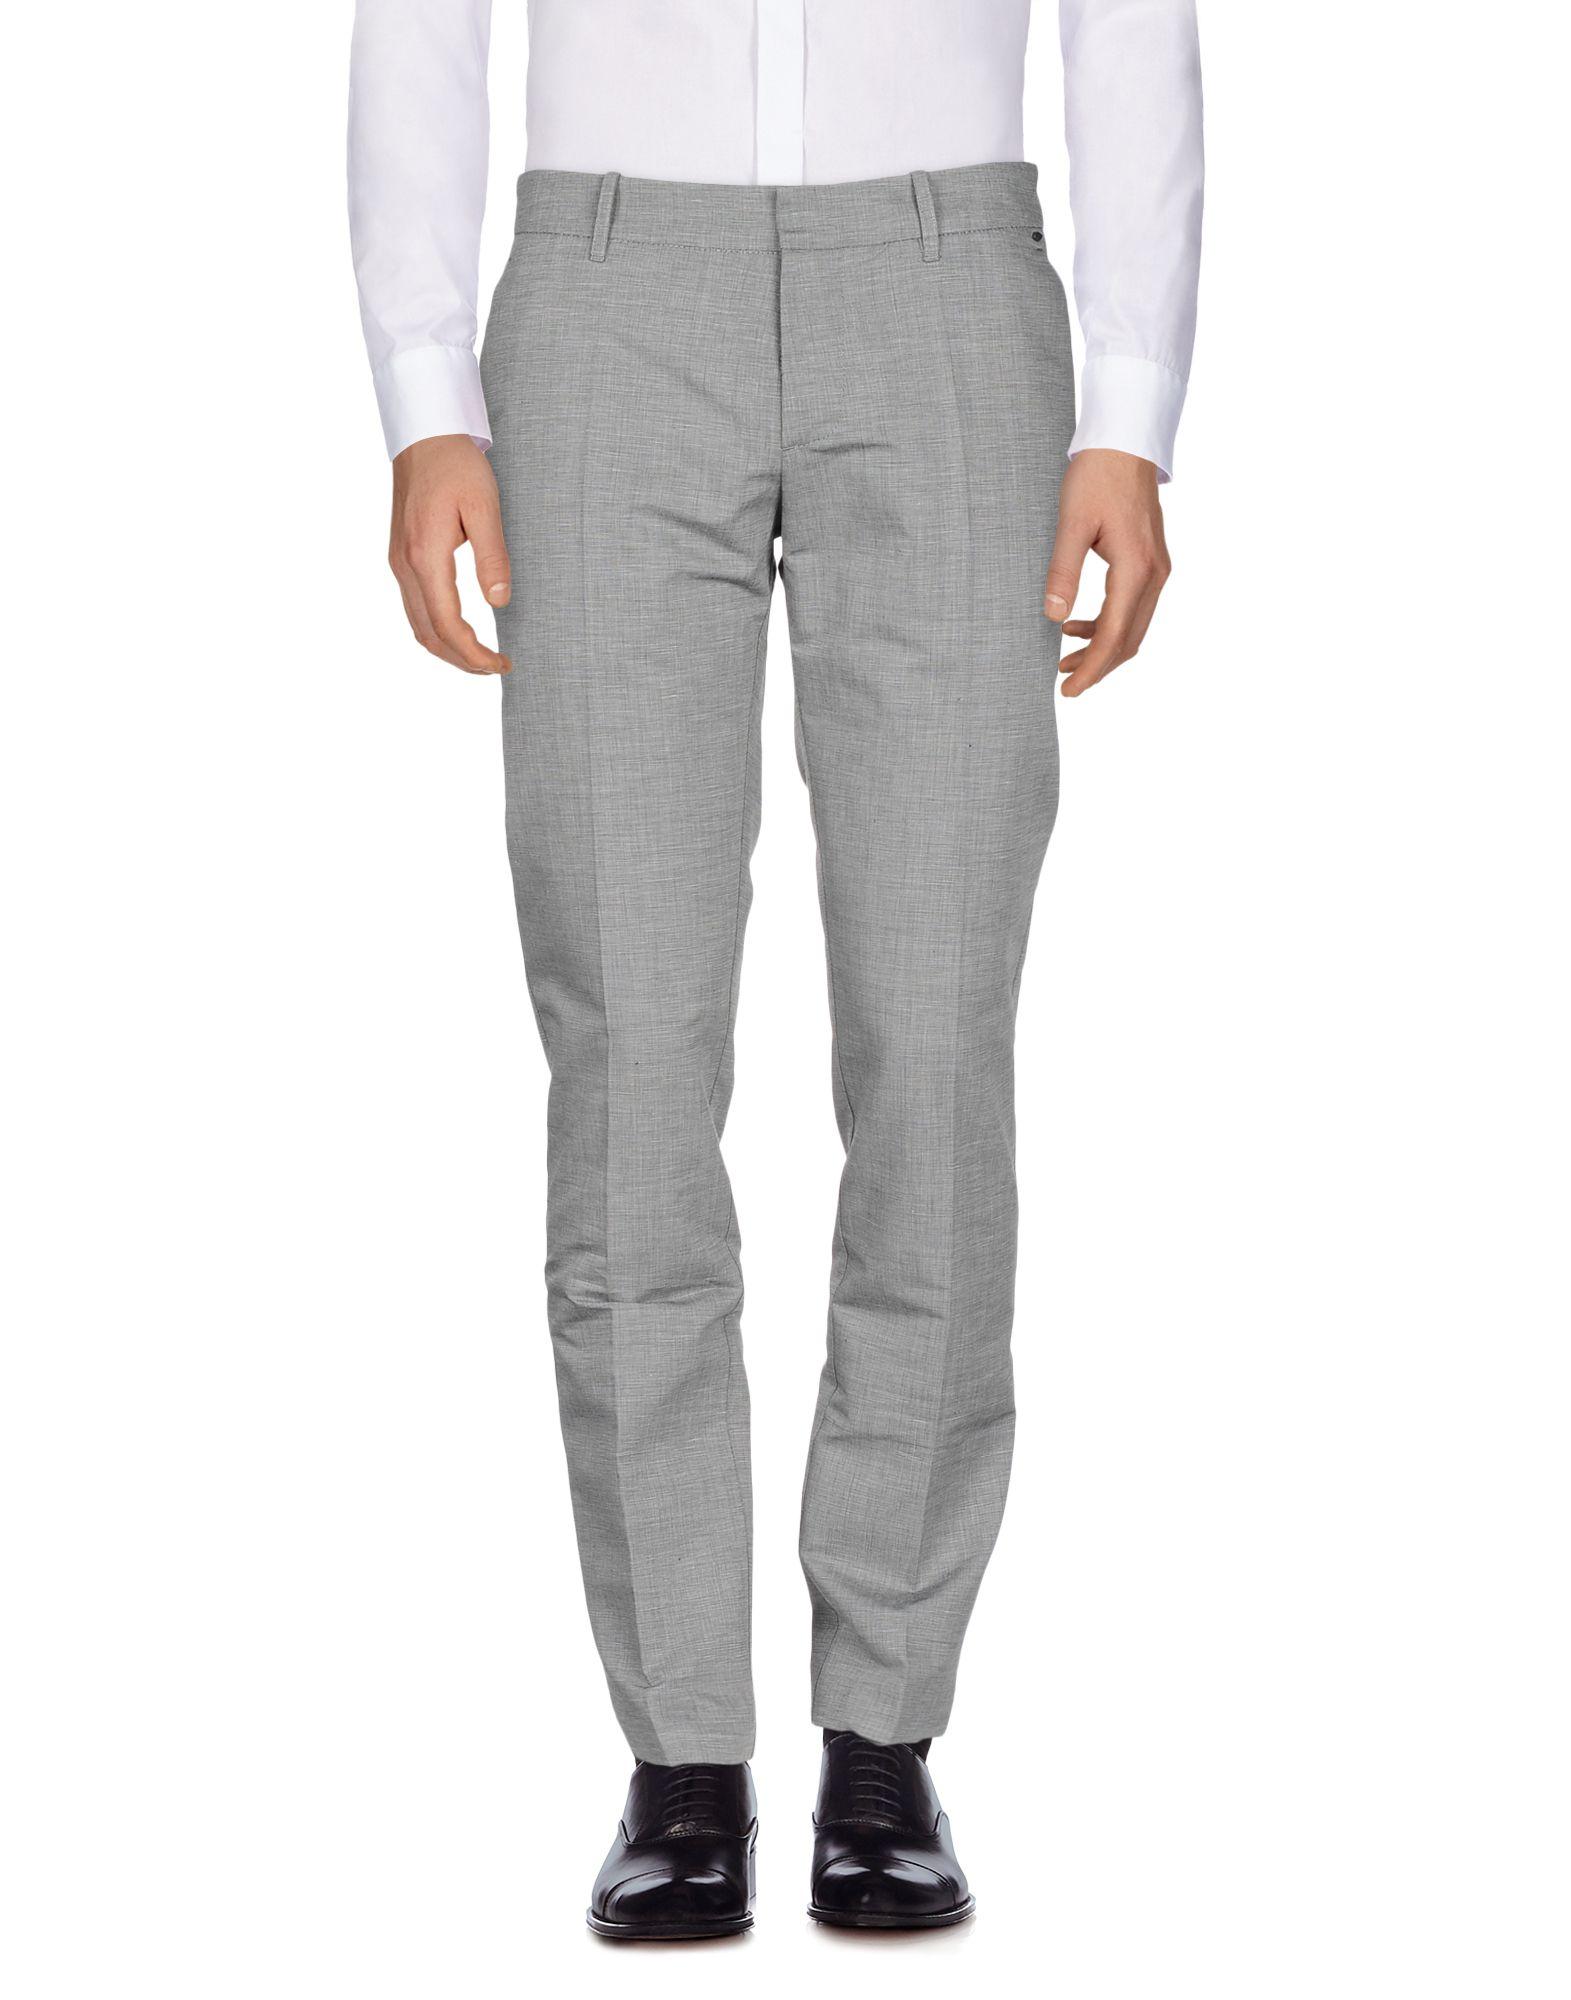 Pantalone Tom Rebl Donna - Acquista online su